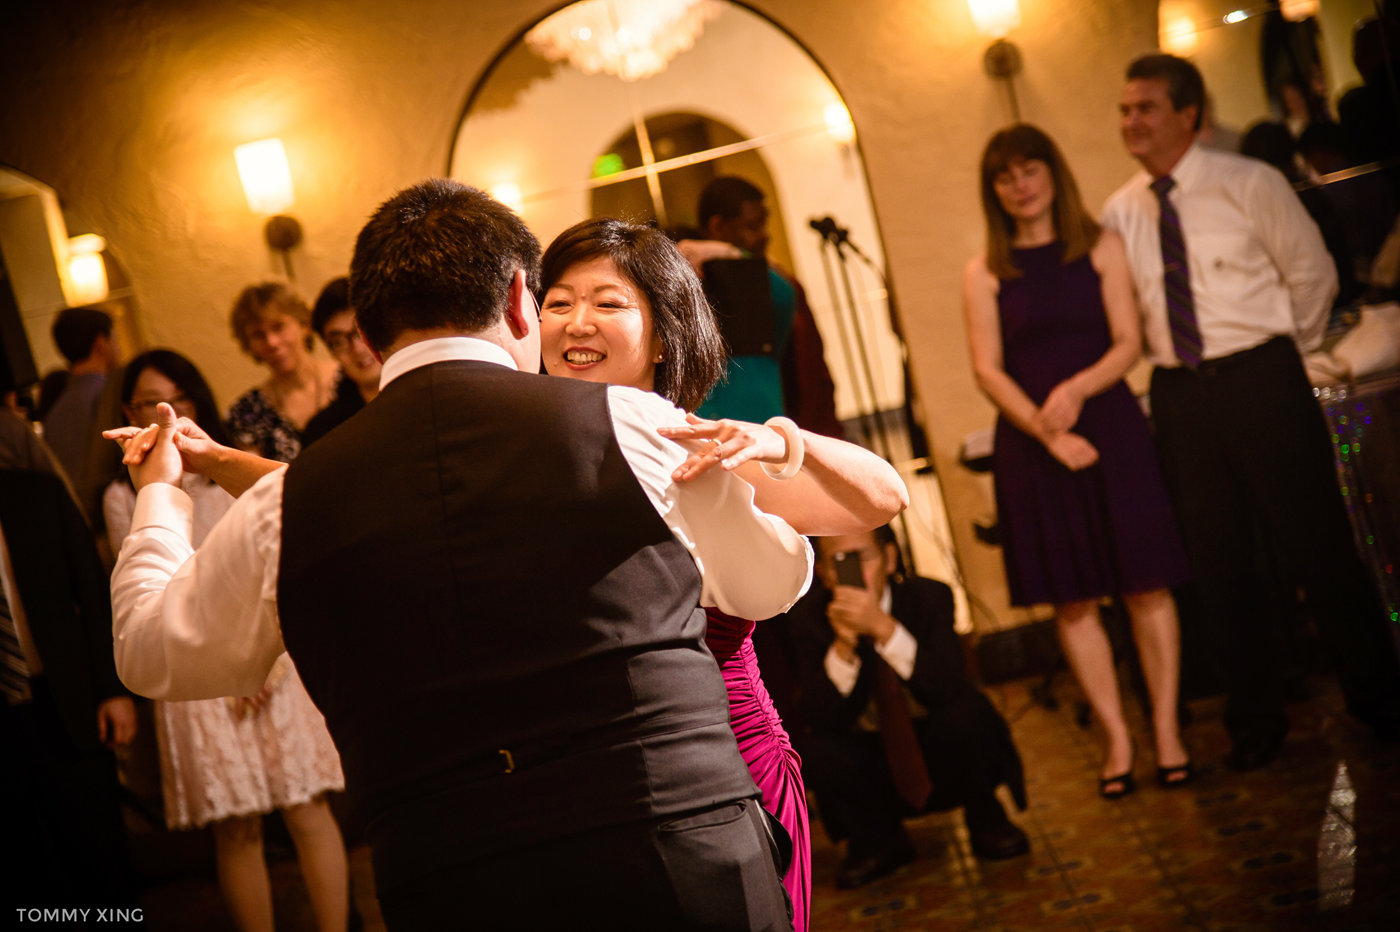 STANFORD MEMORIAL CHURCH WEDDING - Wenjie & Chengcheng - SAN FRANCISCO BAY AREA 斯坦福教堂婚礼跟拍 - 洛杉矶婚礼婚纱照摄影师 Tommy Xing Photography263.jpg